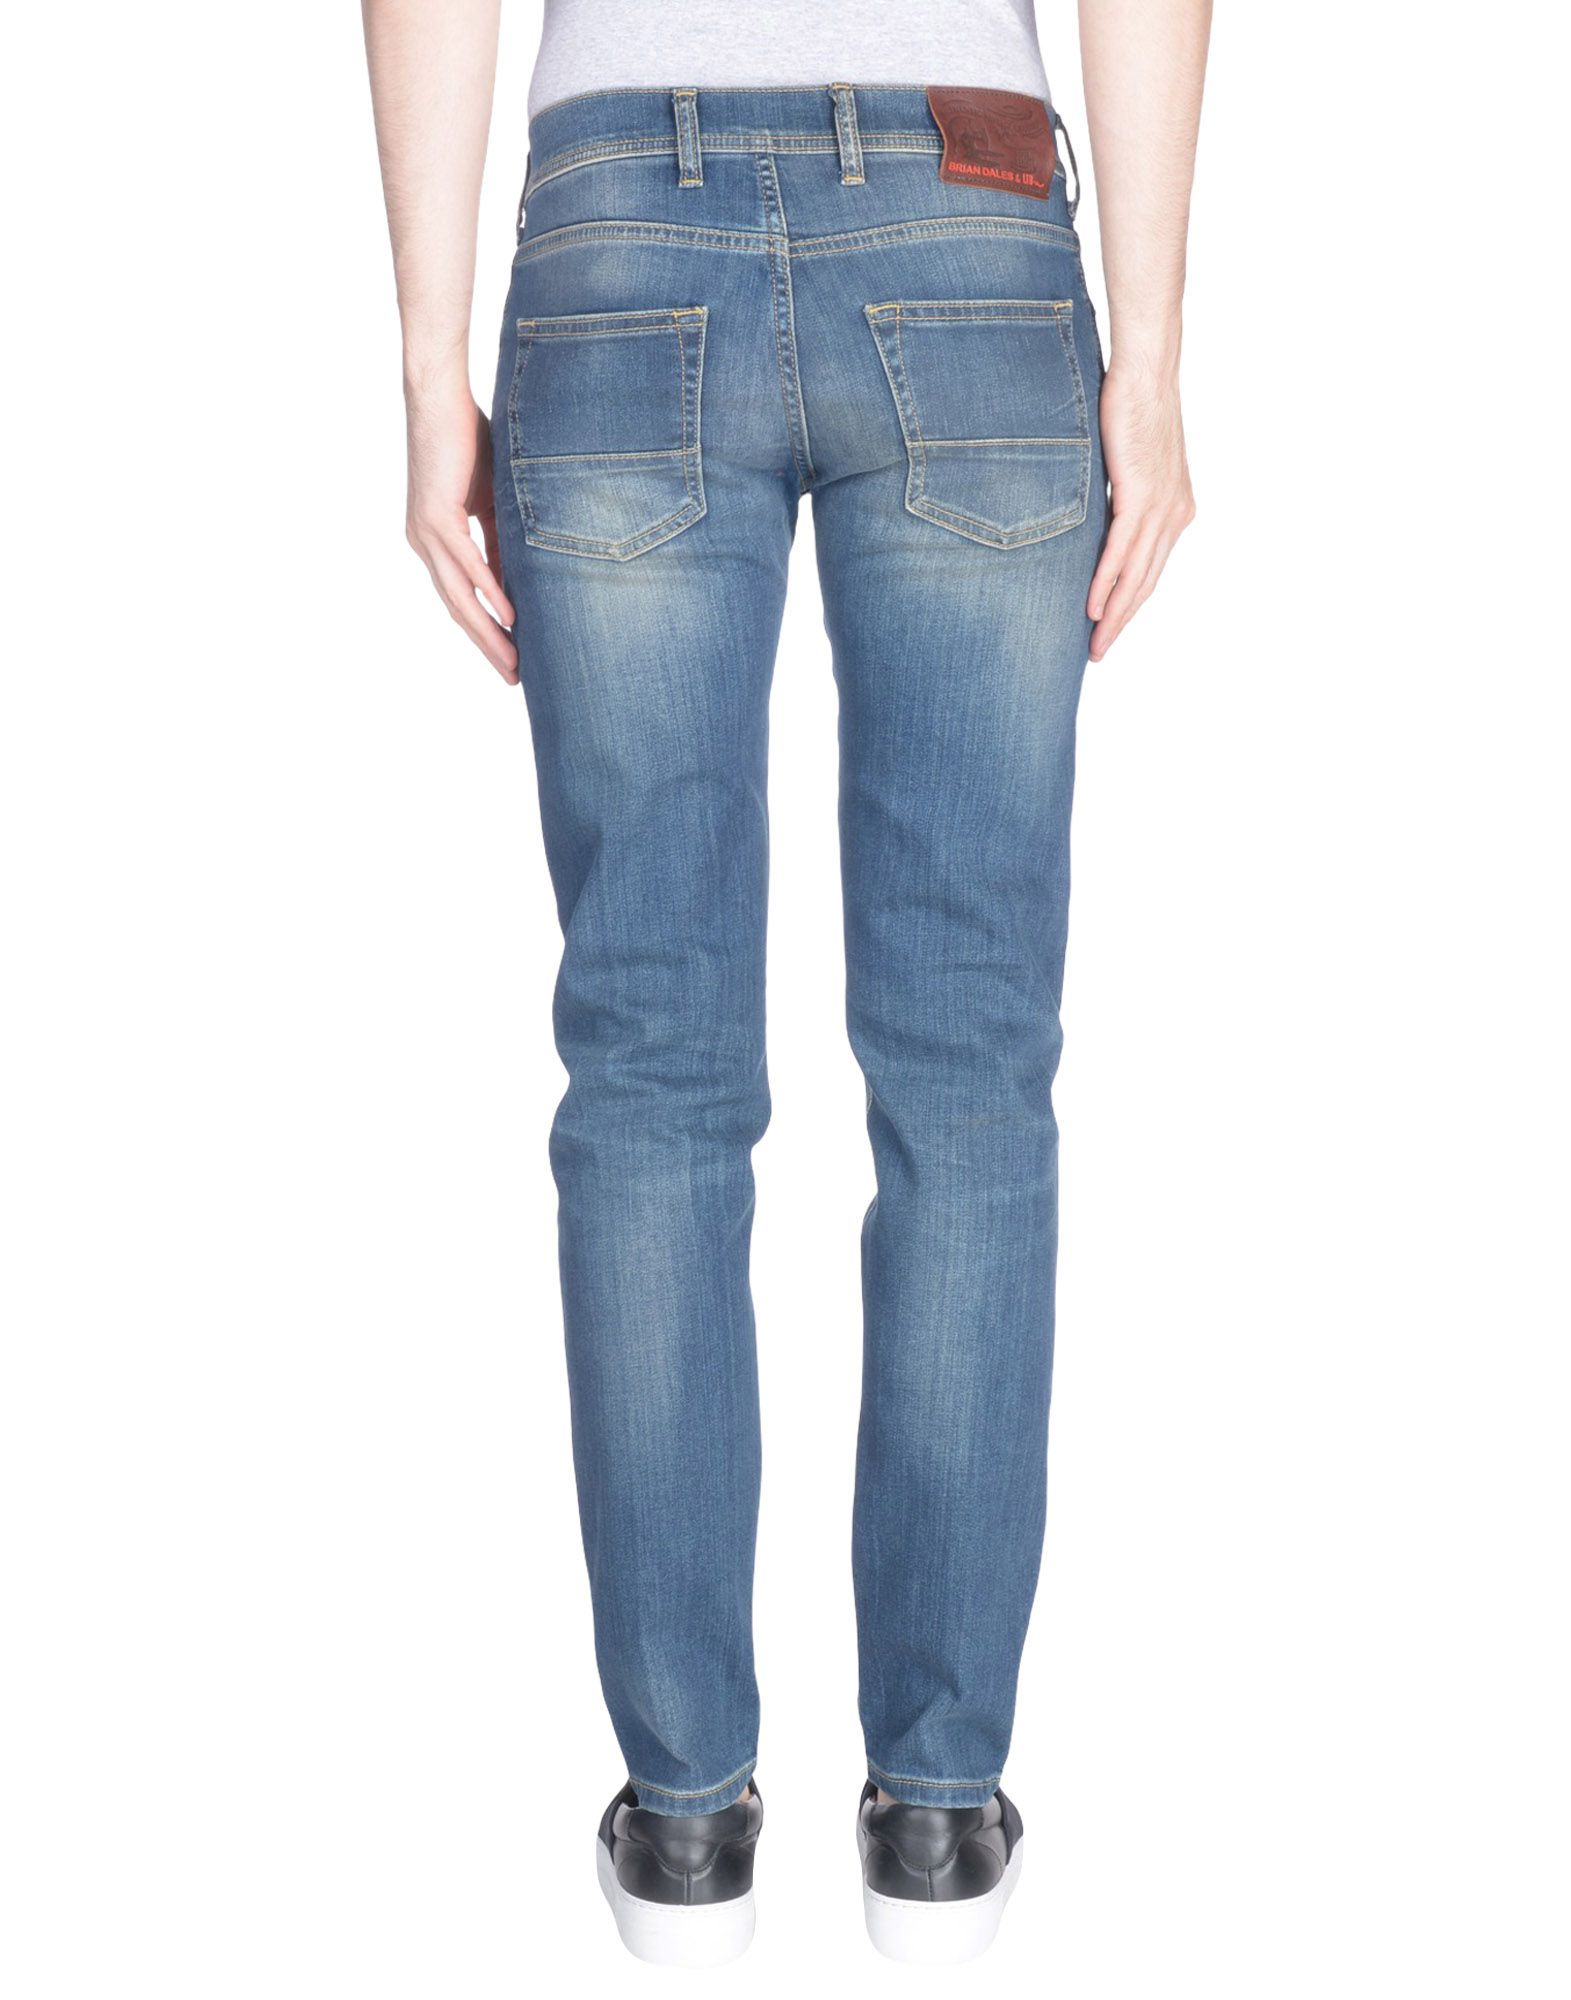 Pantaloni Jeans Jeans Pantaloni Brian Dales & Ltb Uomo - 42640250EP 2fee45